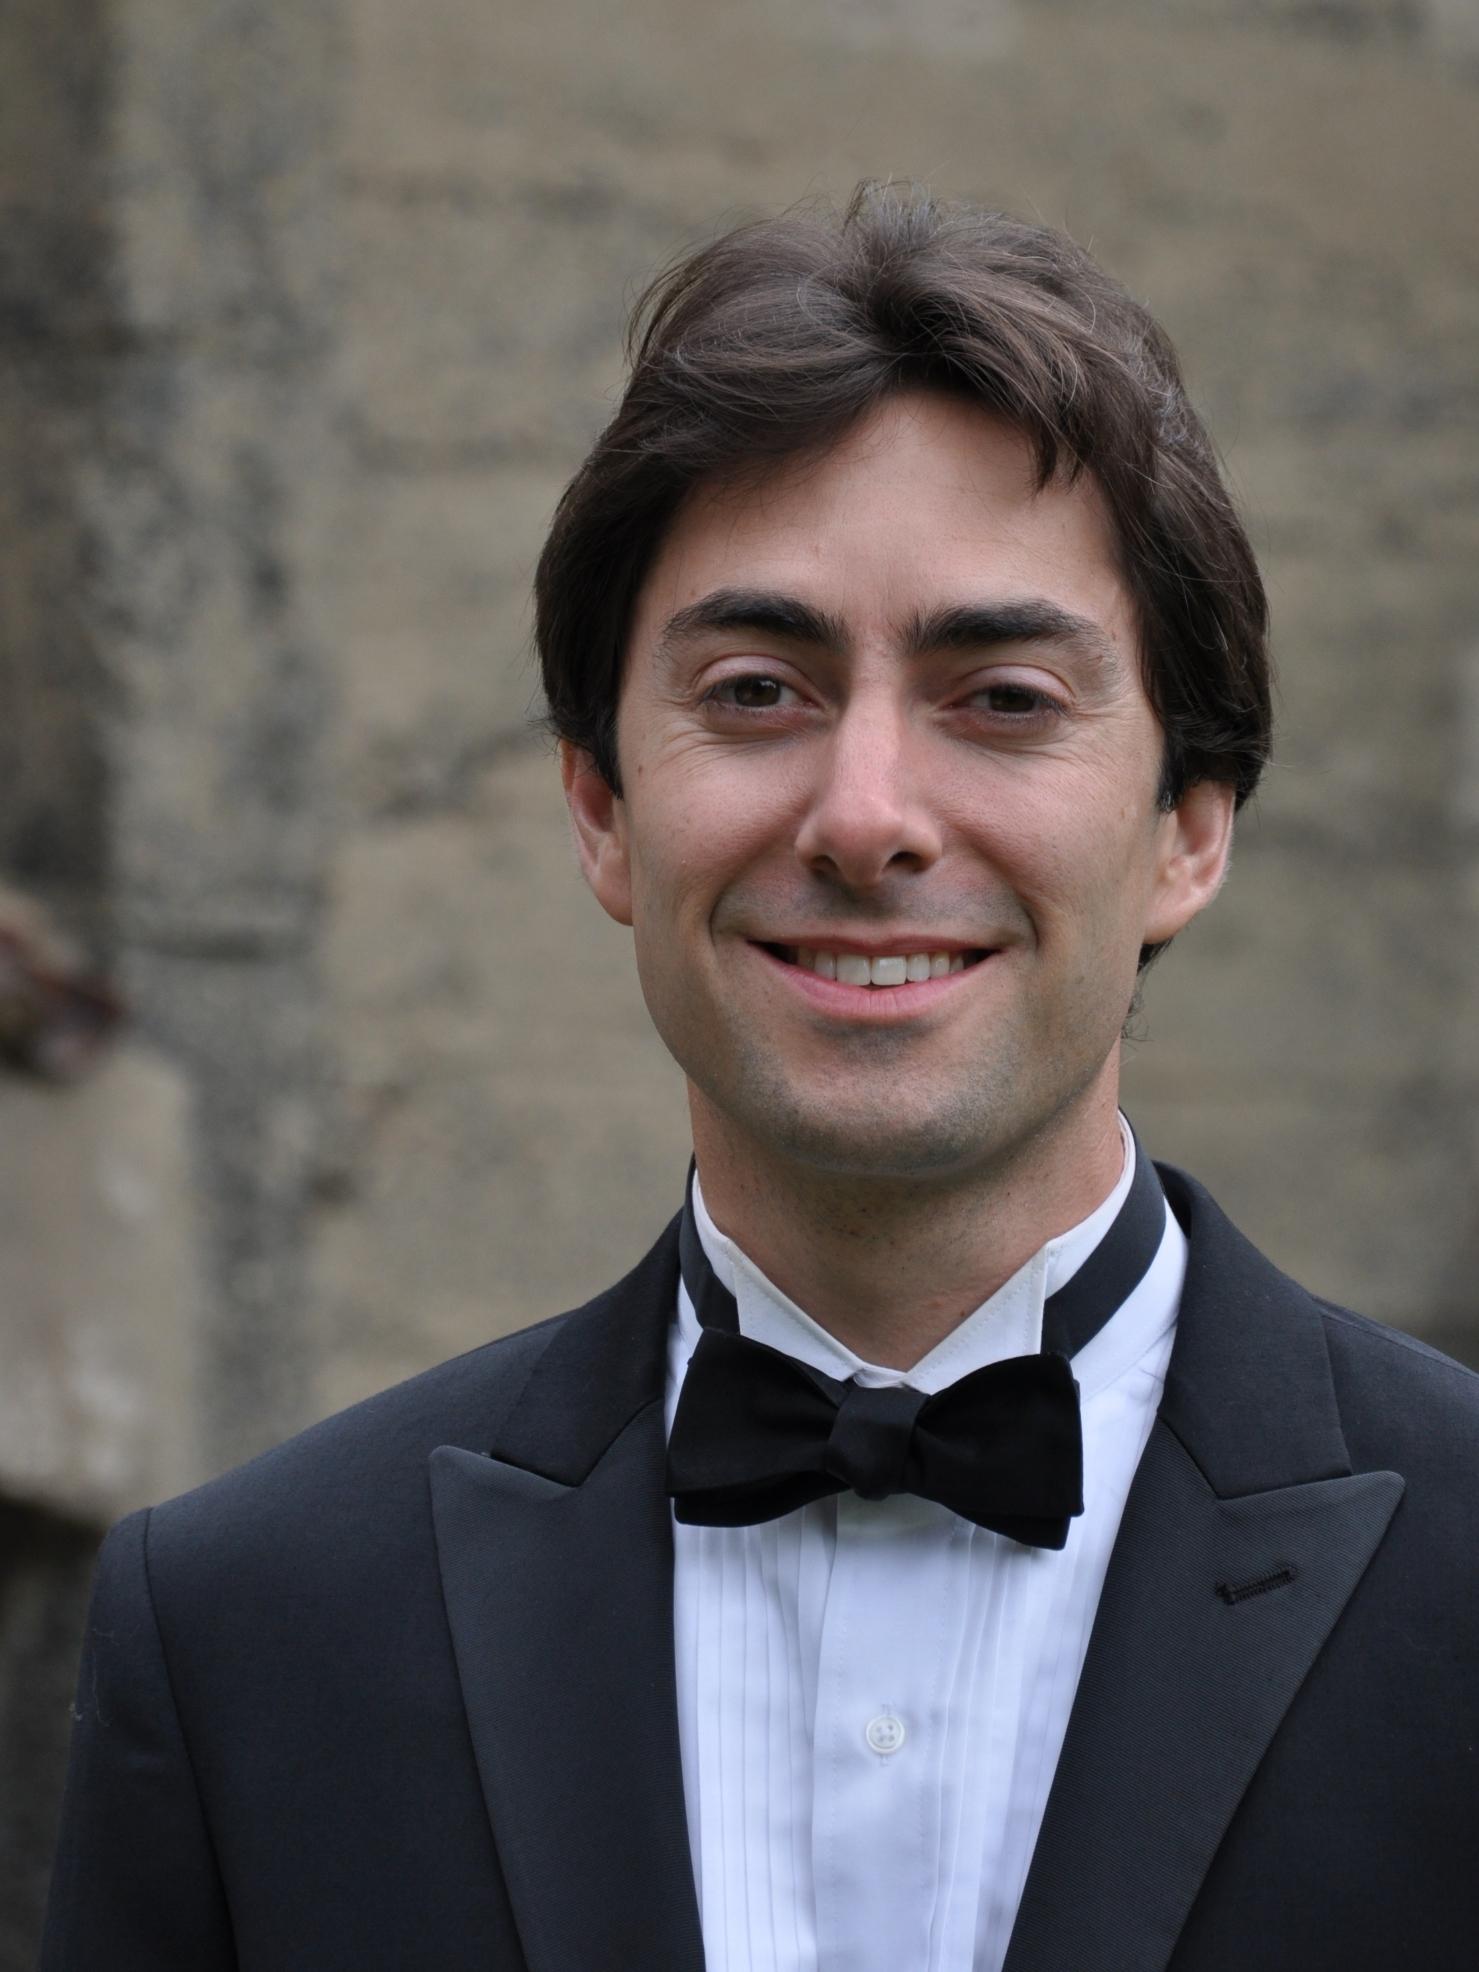 Michael Cosdon